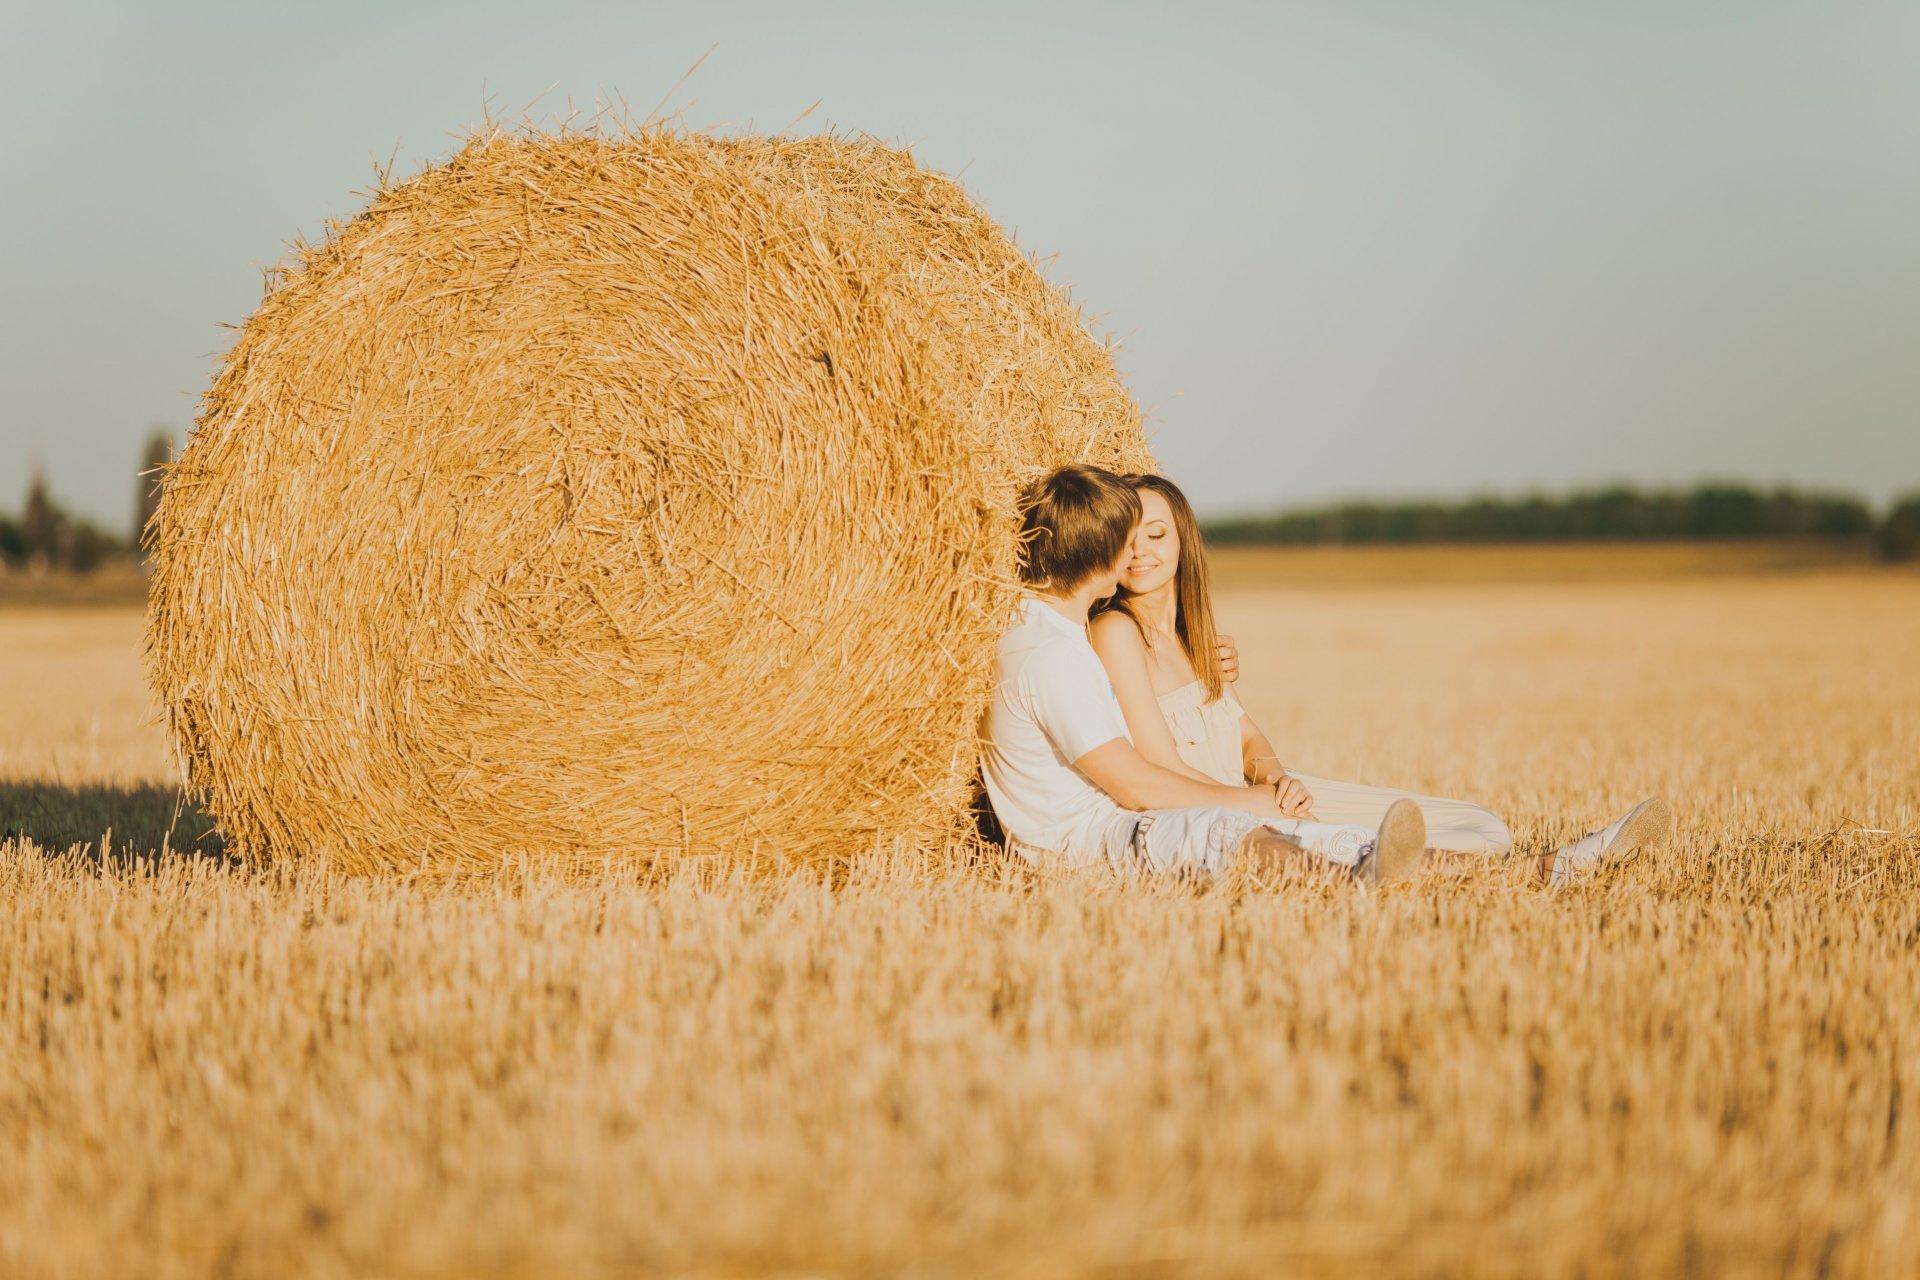 Картинки девушка брюнетка с парнем на природе